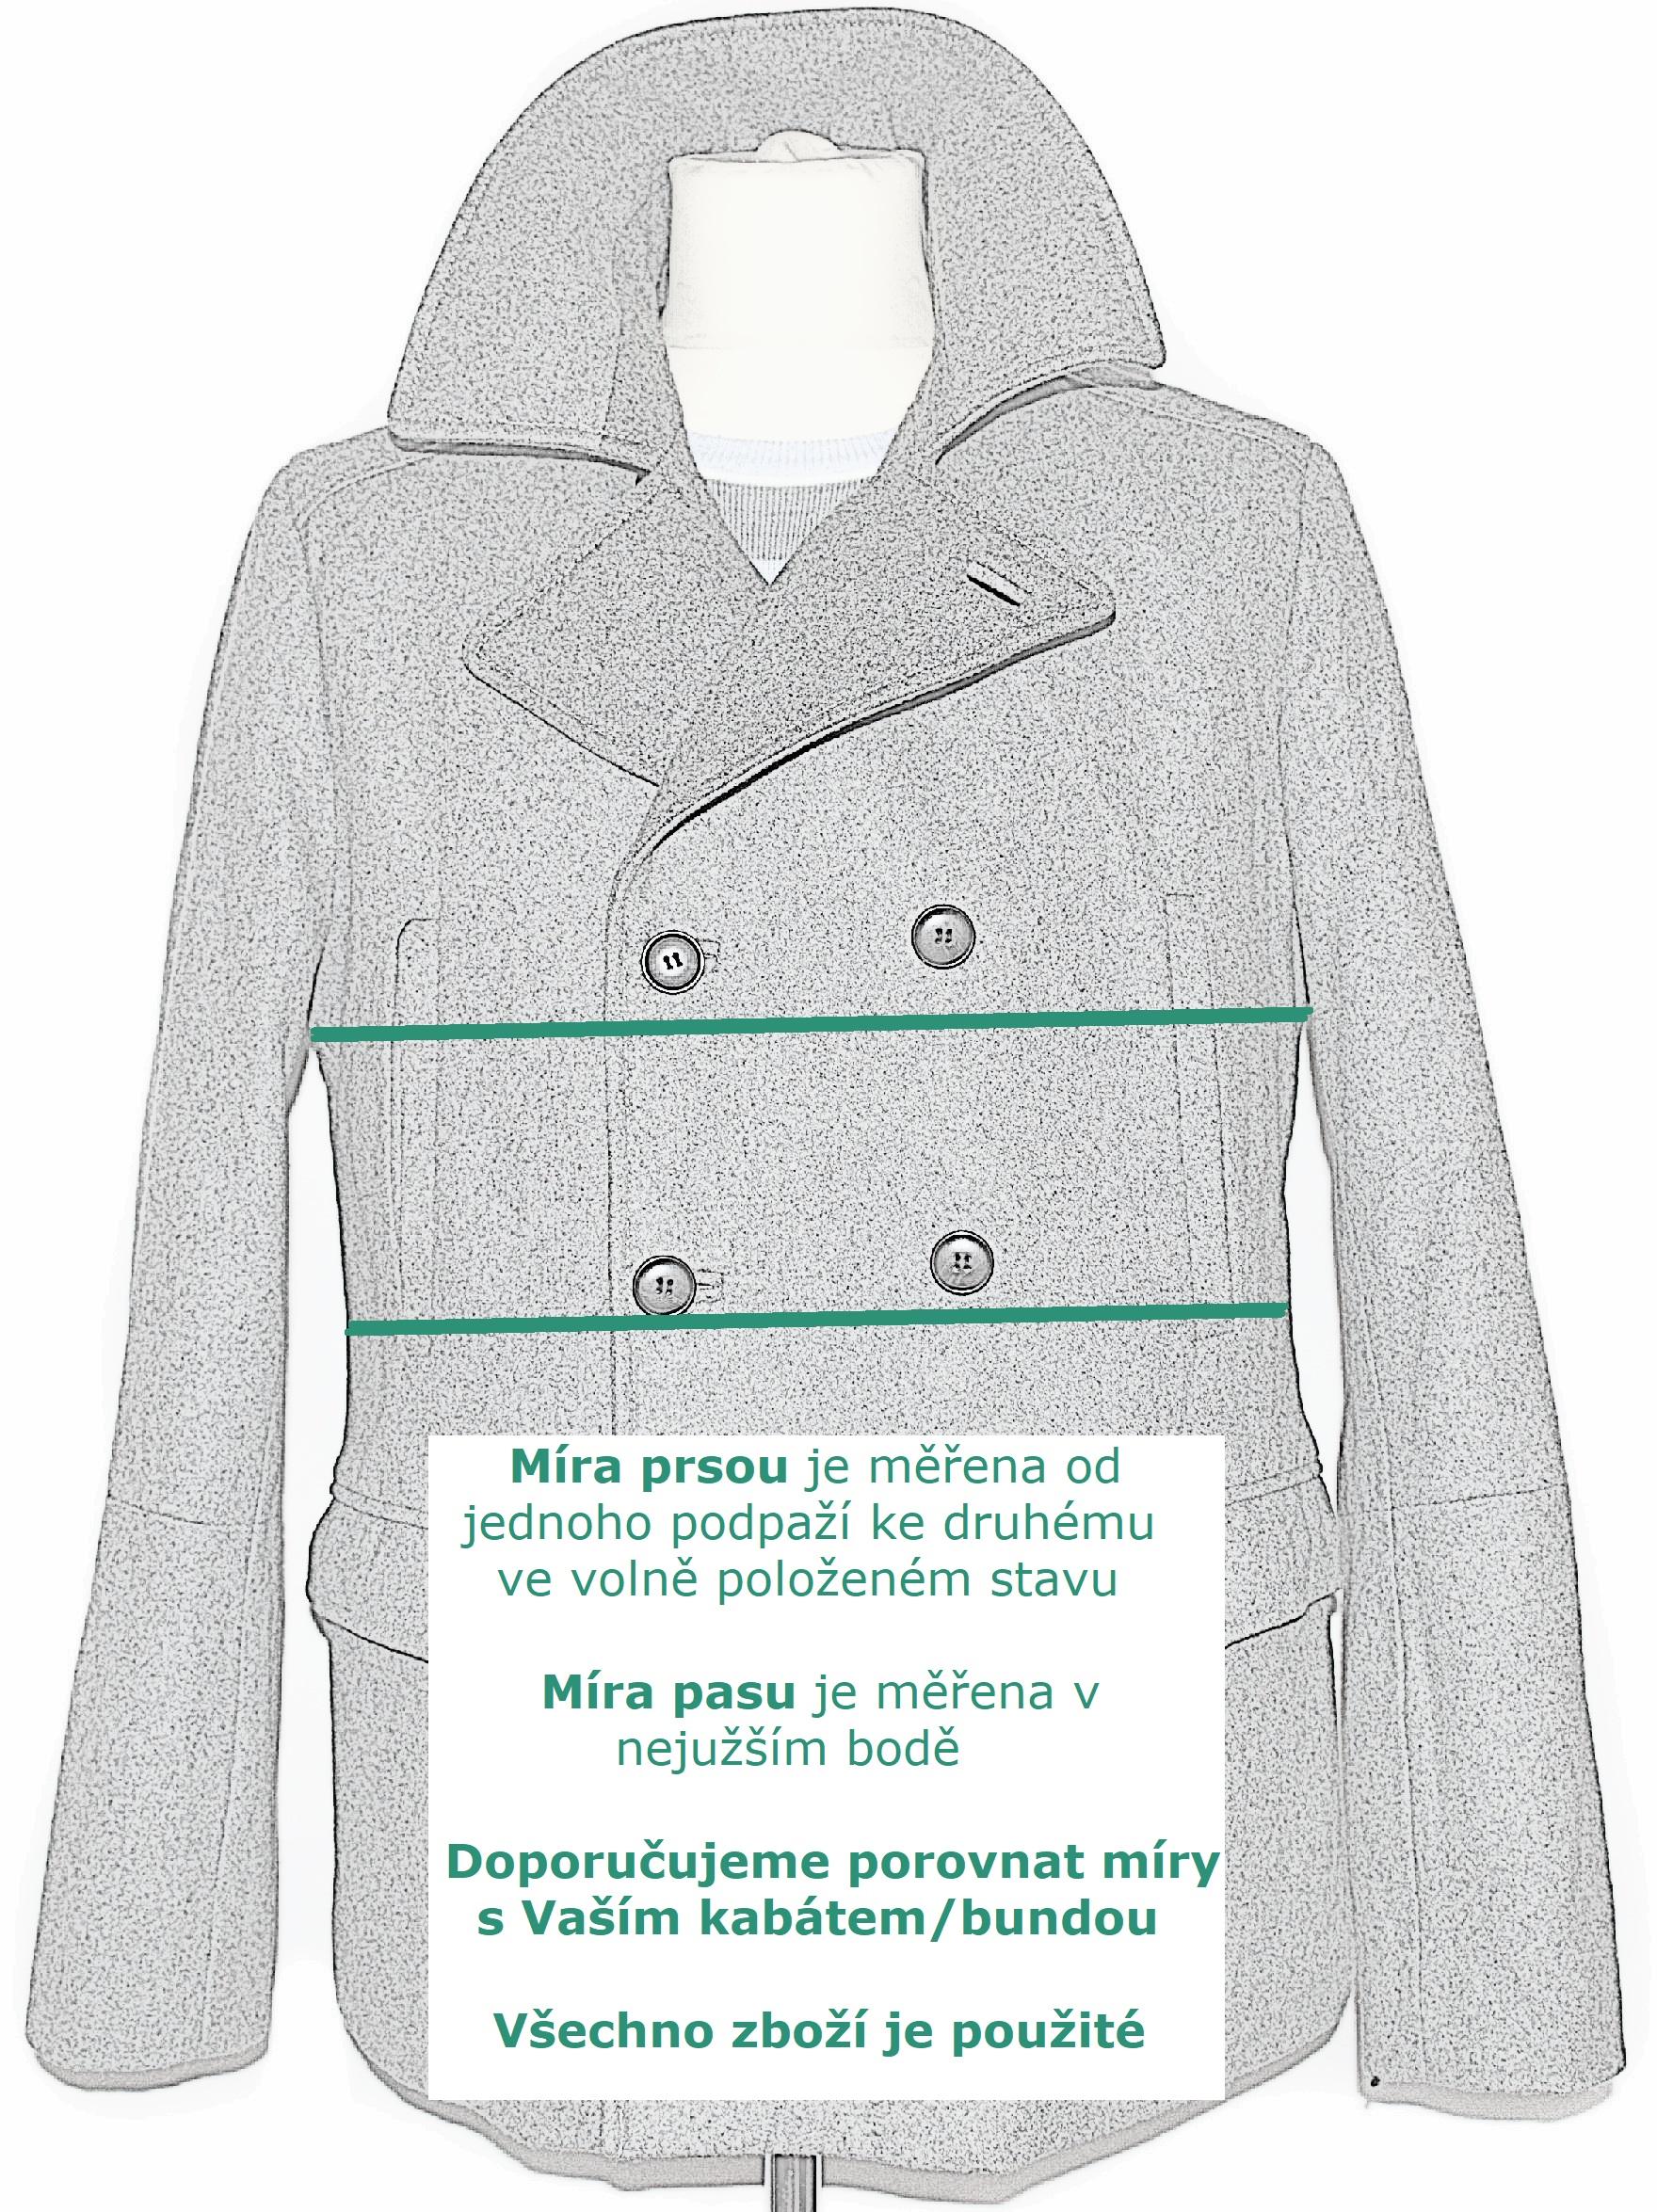 KOŽENÁ pánská béžová bunda na zip BURTON vel. M